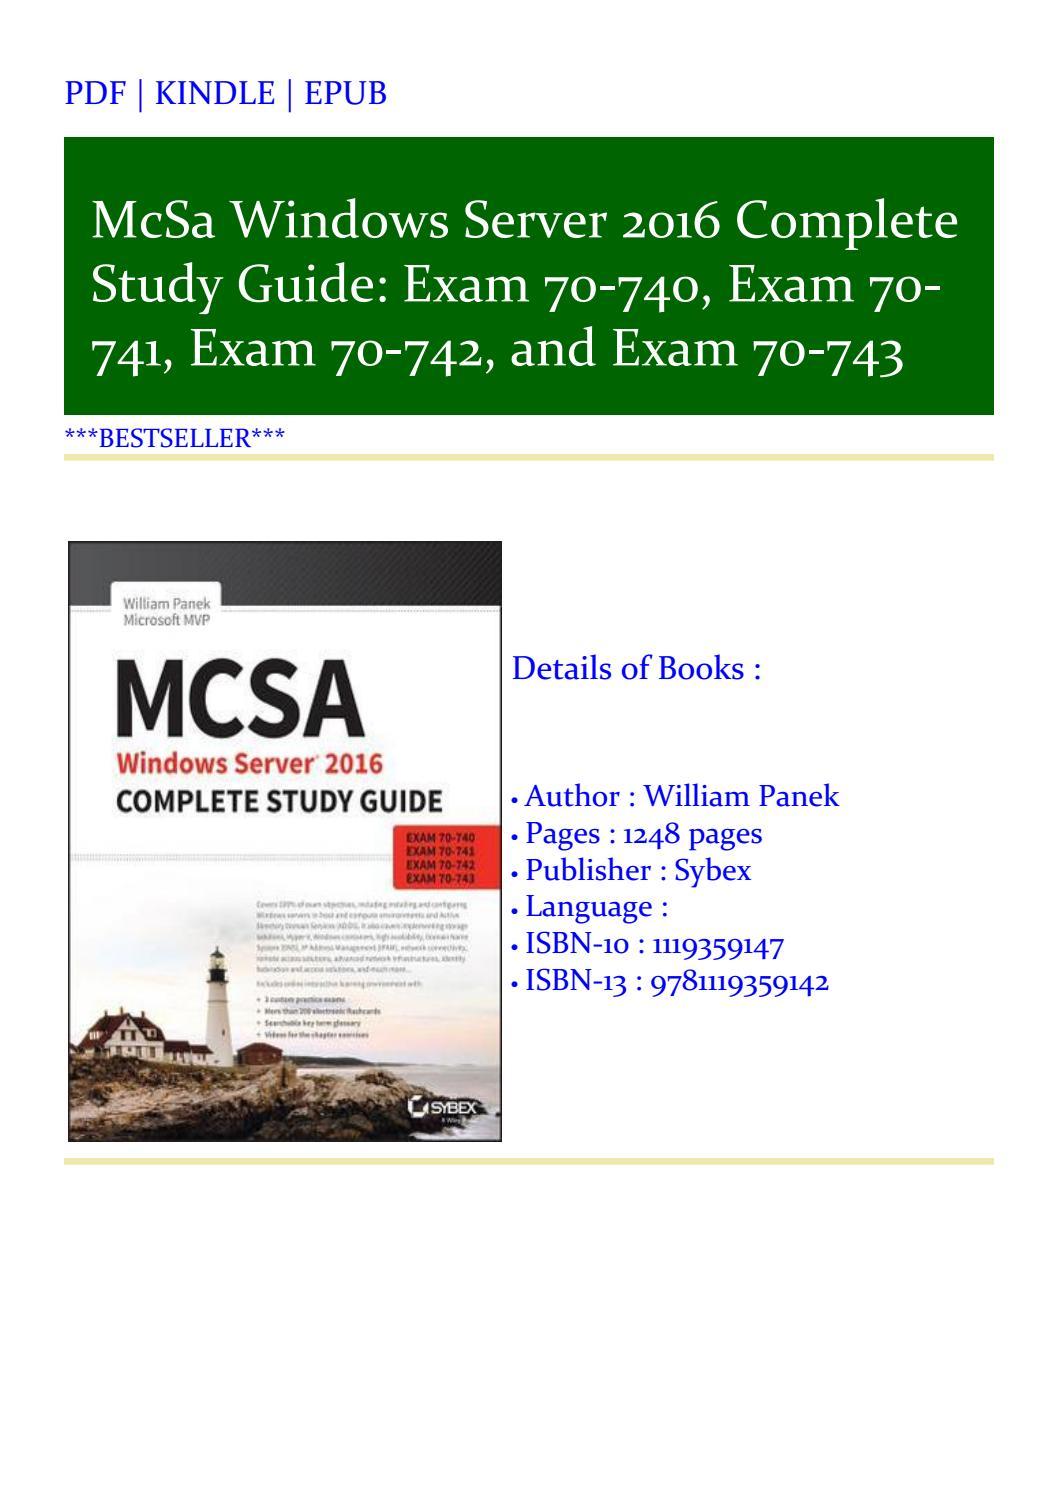 Exam 70-741 MCSA Windows Server 2016 Practice Tests: Exam 70-740 and Exam 70-743 Exam 70-742